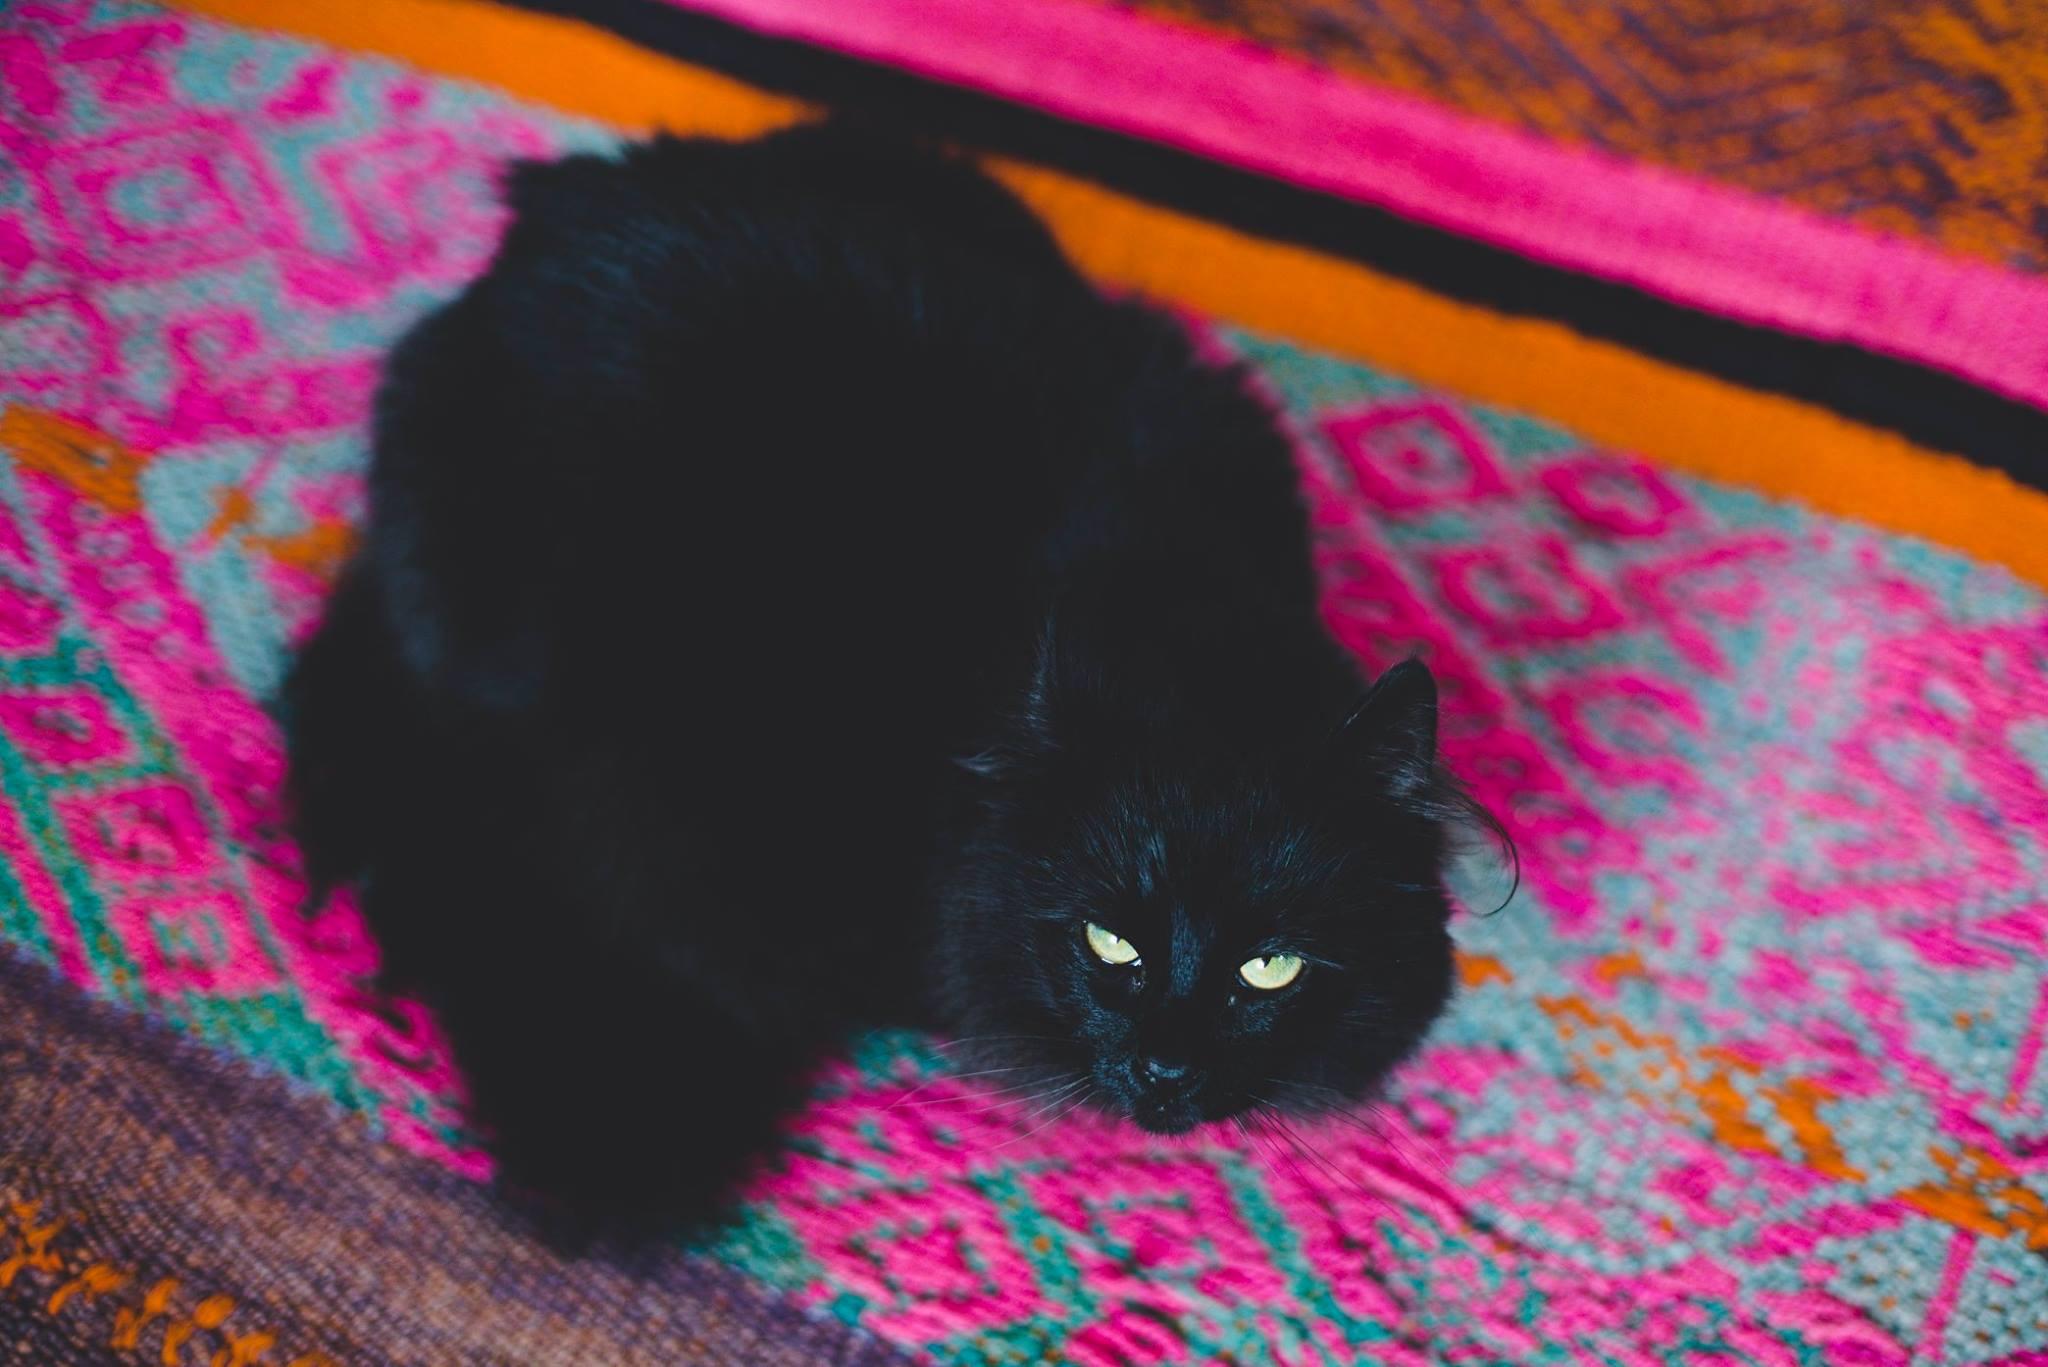 Bellatrix Lestrange The Wizard Kitty: The silky one.